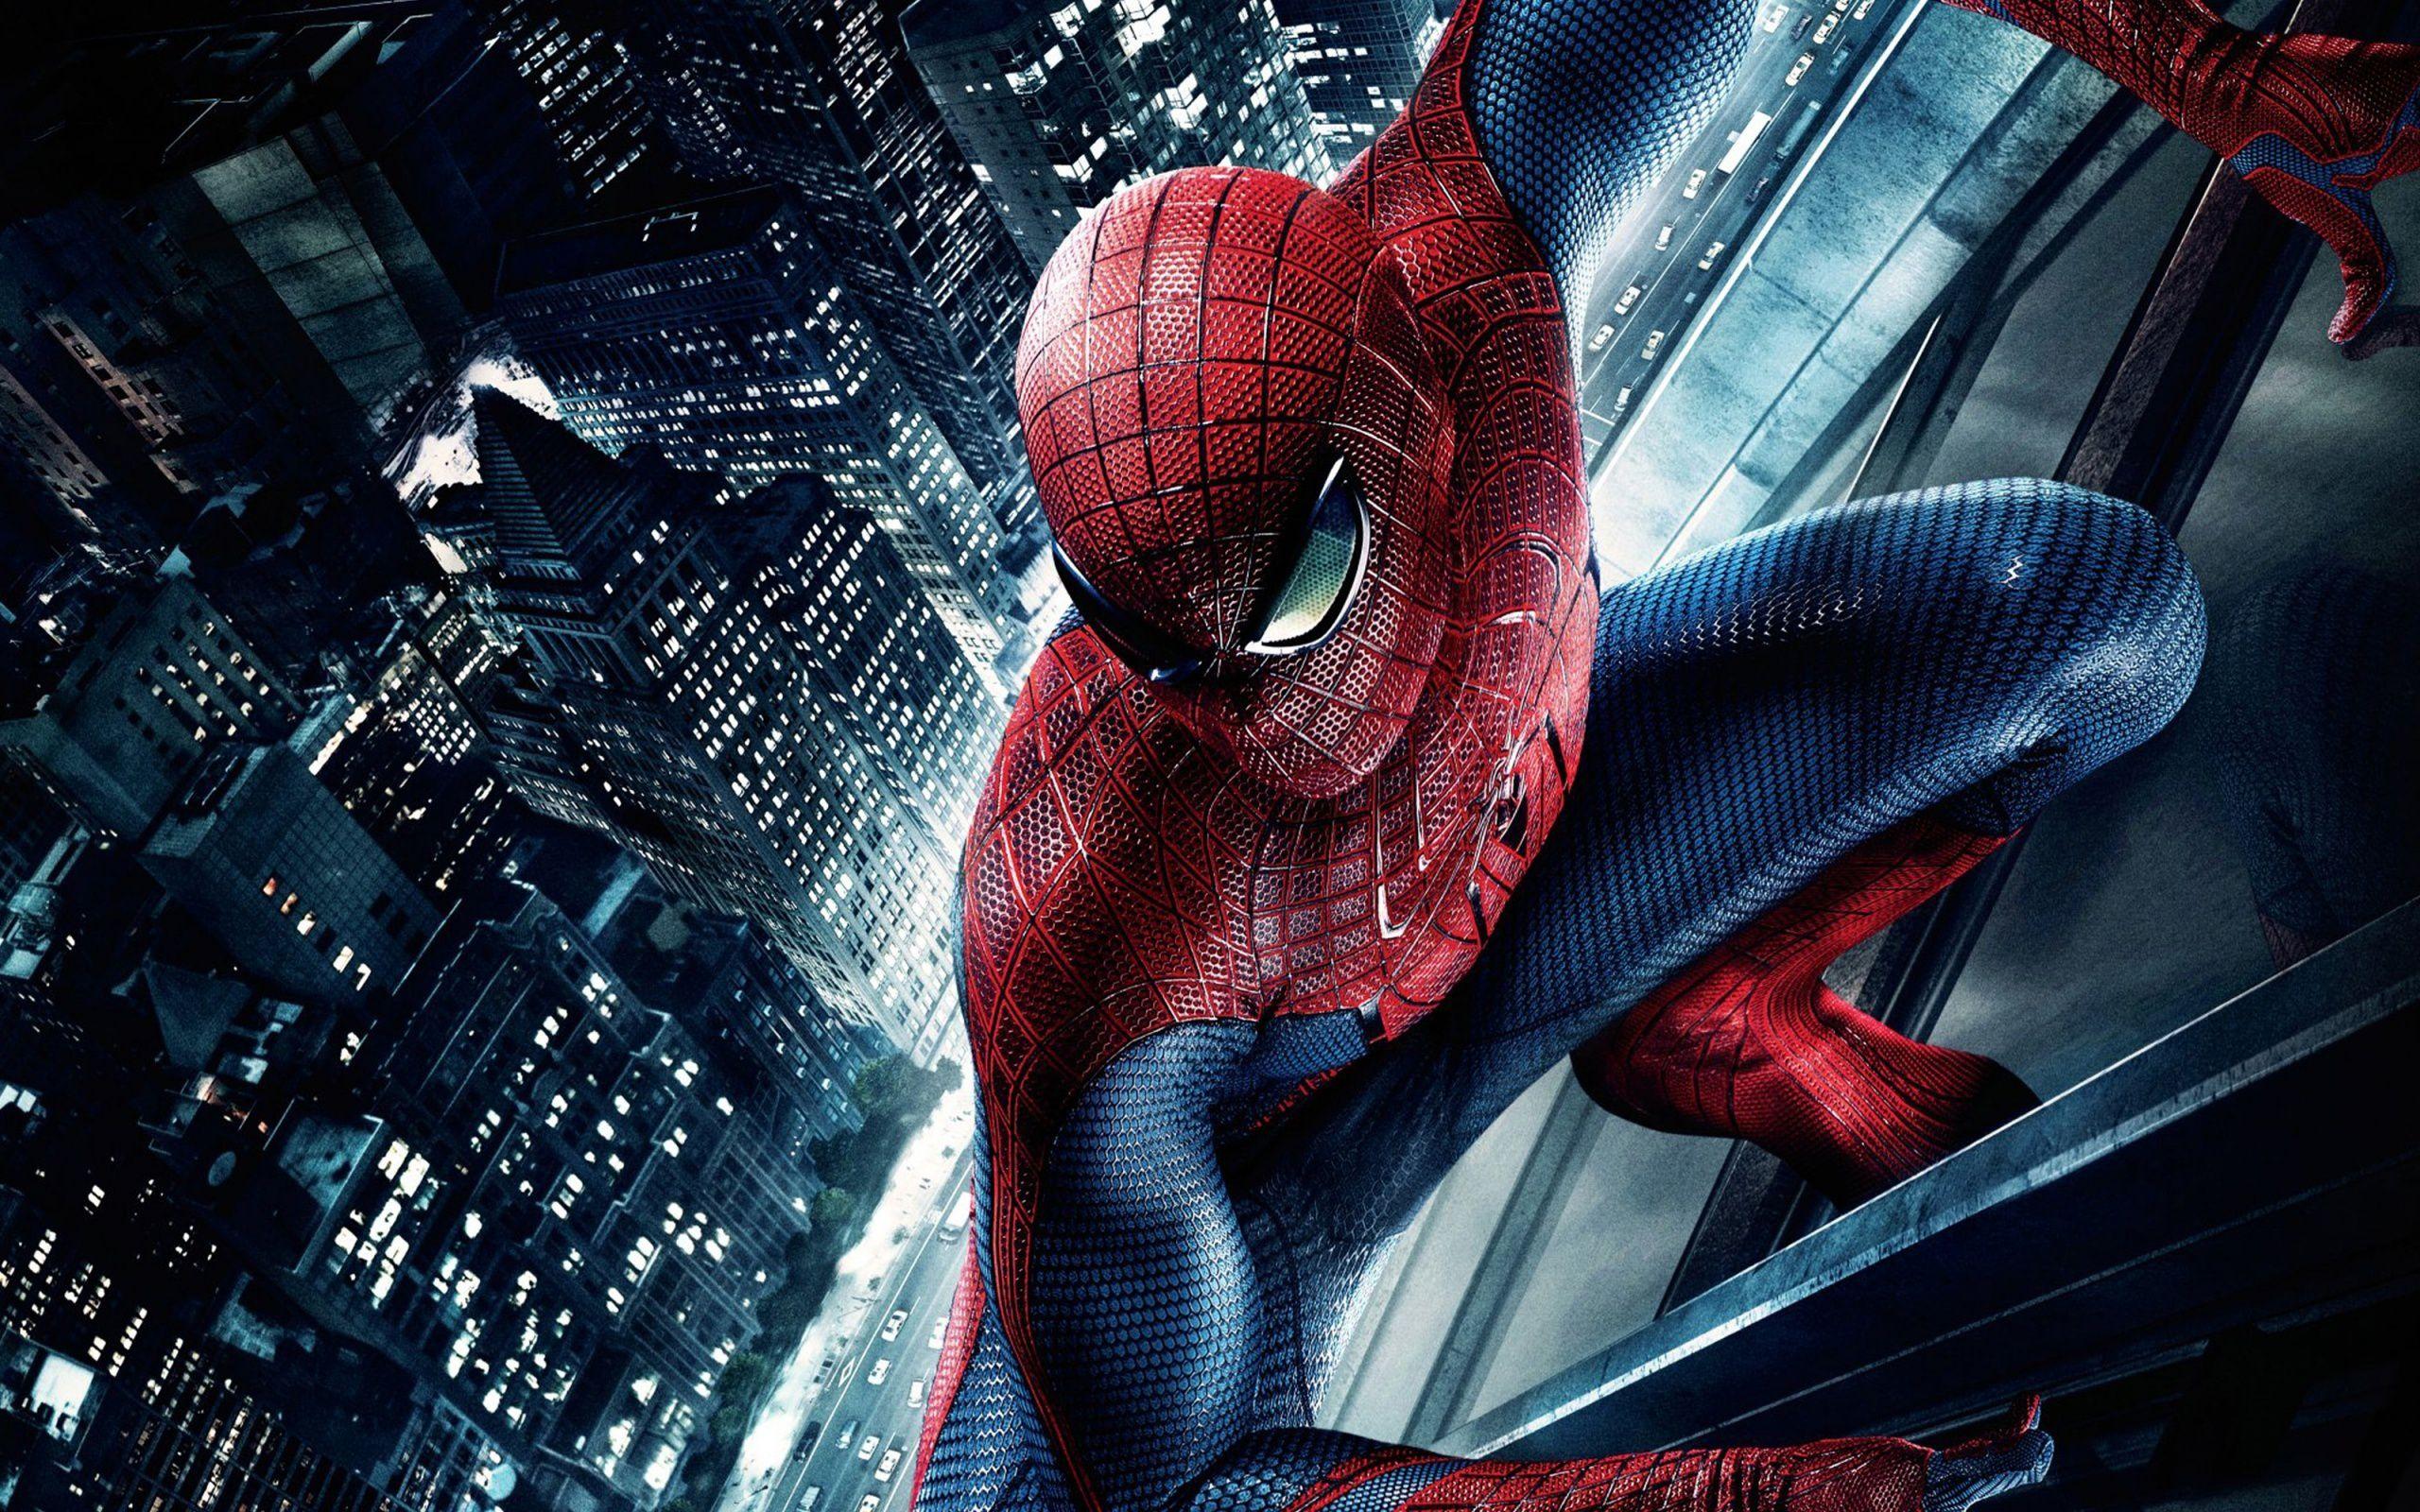 Oblíbená postavička: Spiderman